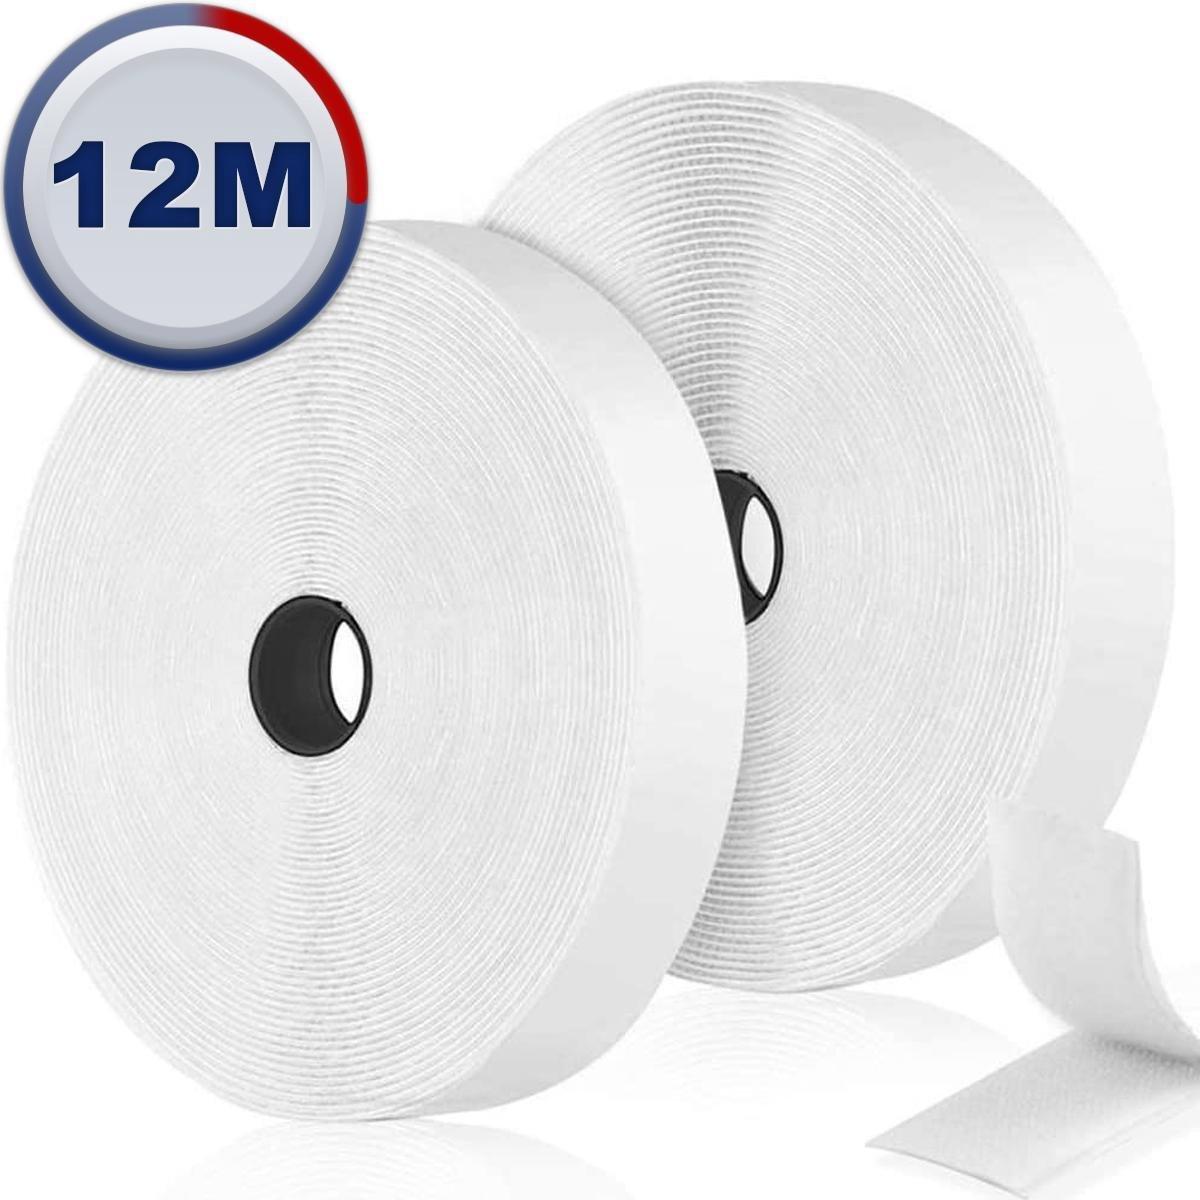 AWEMOZ  Klittenband Zelfklevend - Witte Velcro - Klussen - 2 x 12 m Velcro Tape - 2 cm breed